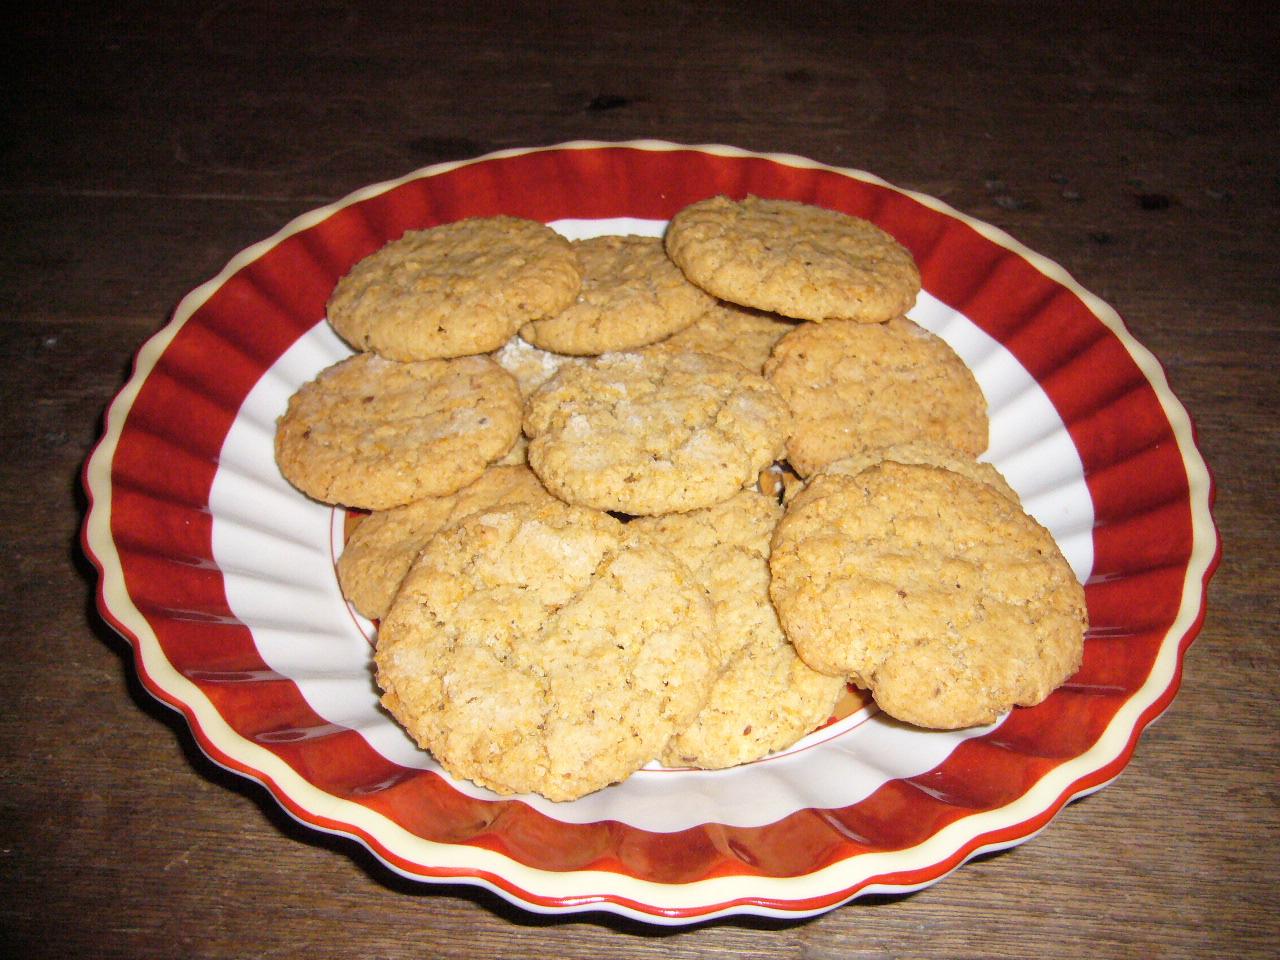 7 Aneka Rasa Resep Kue Kering Cornflakes Yang Mudah Dibuat